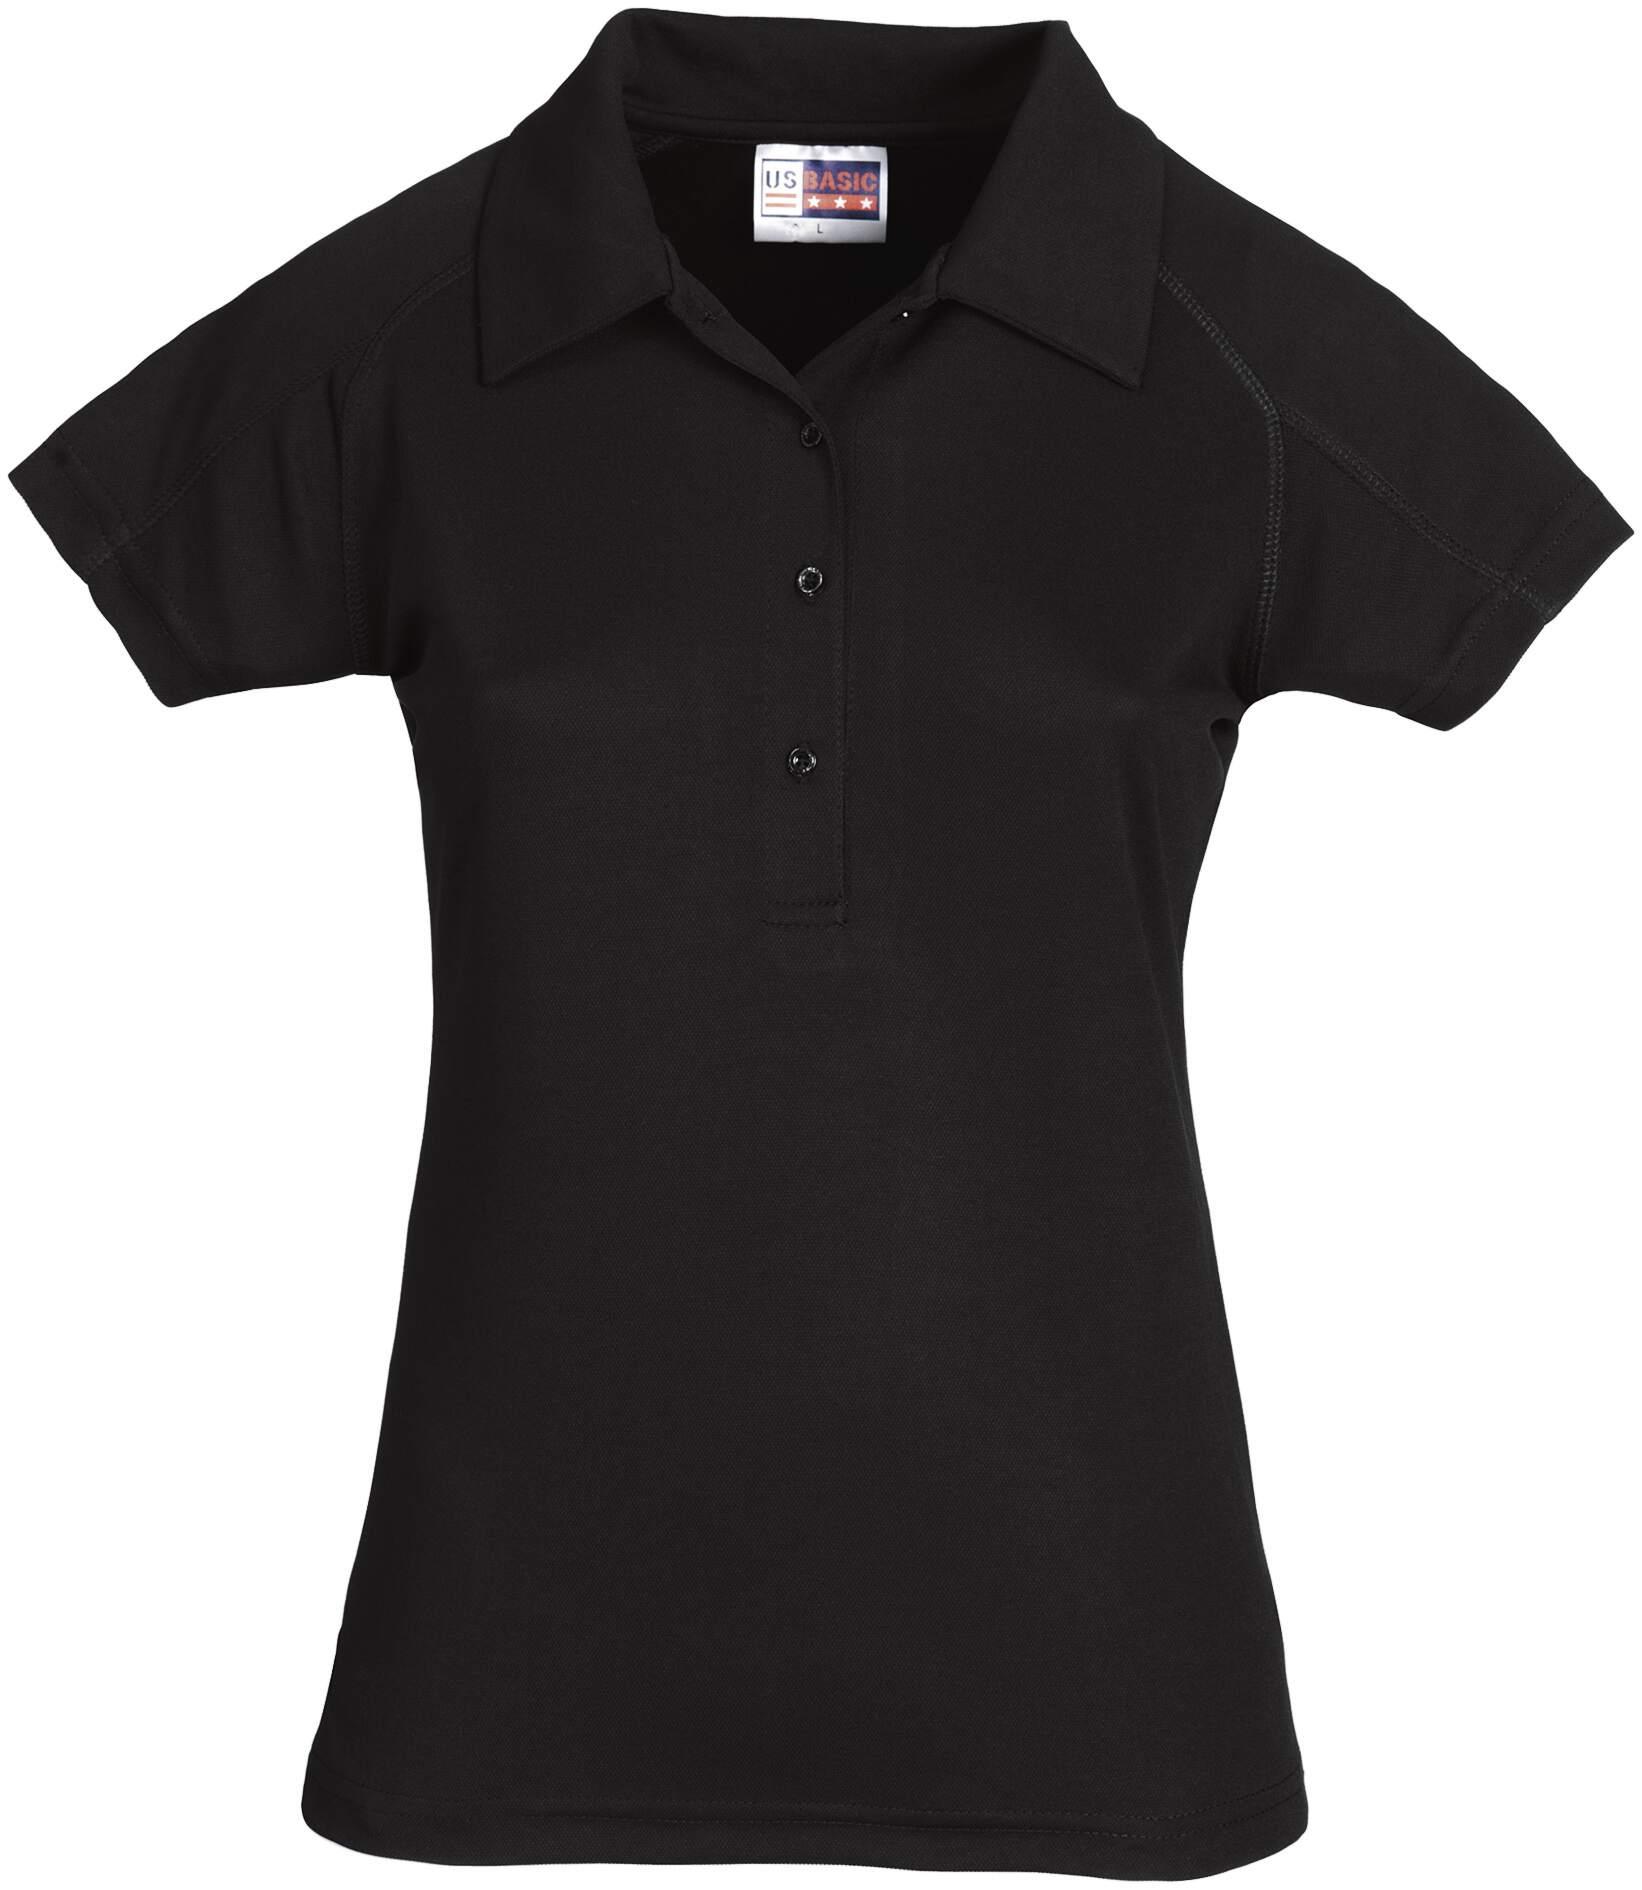 Koszulki Polo US 31097 Cool Fit - 31097_czarny_US - Kolor: Czarny